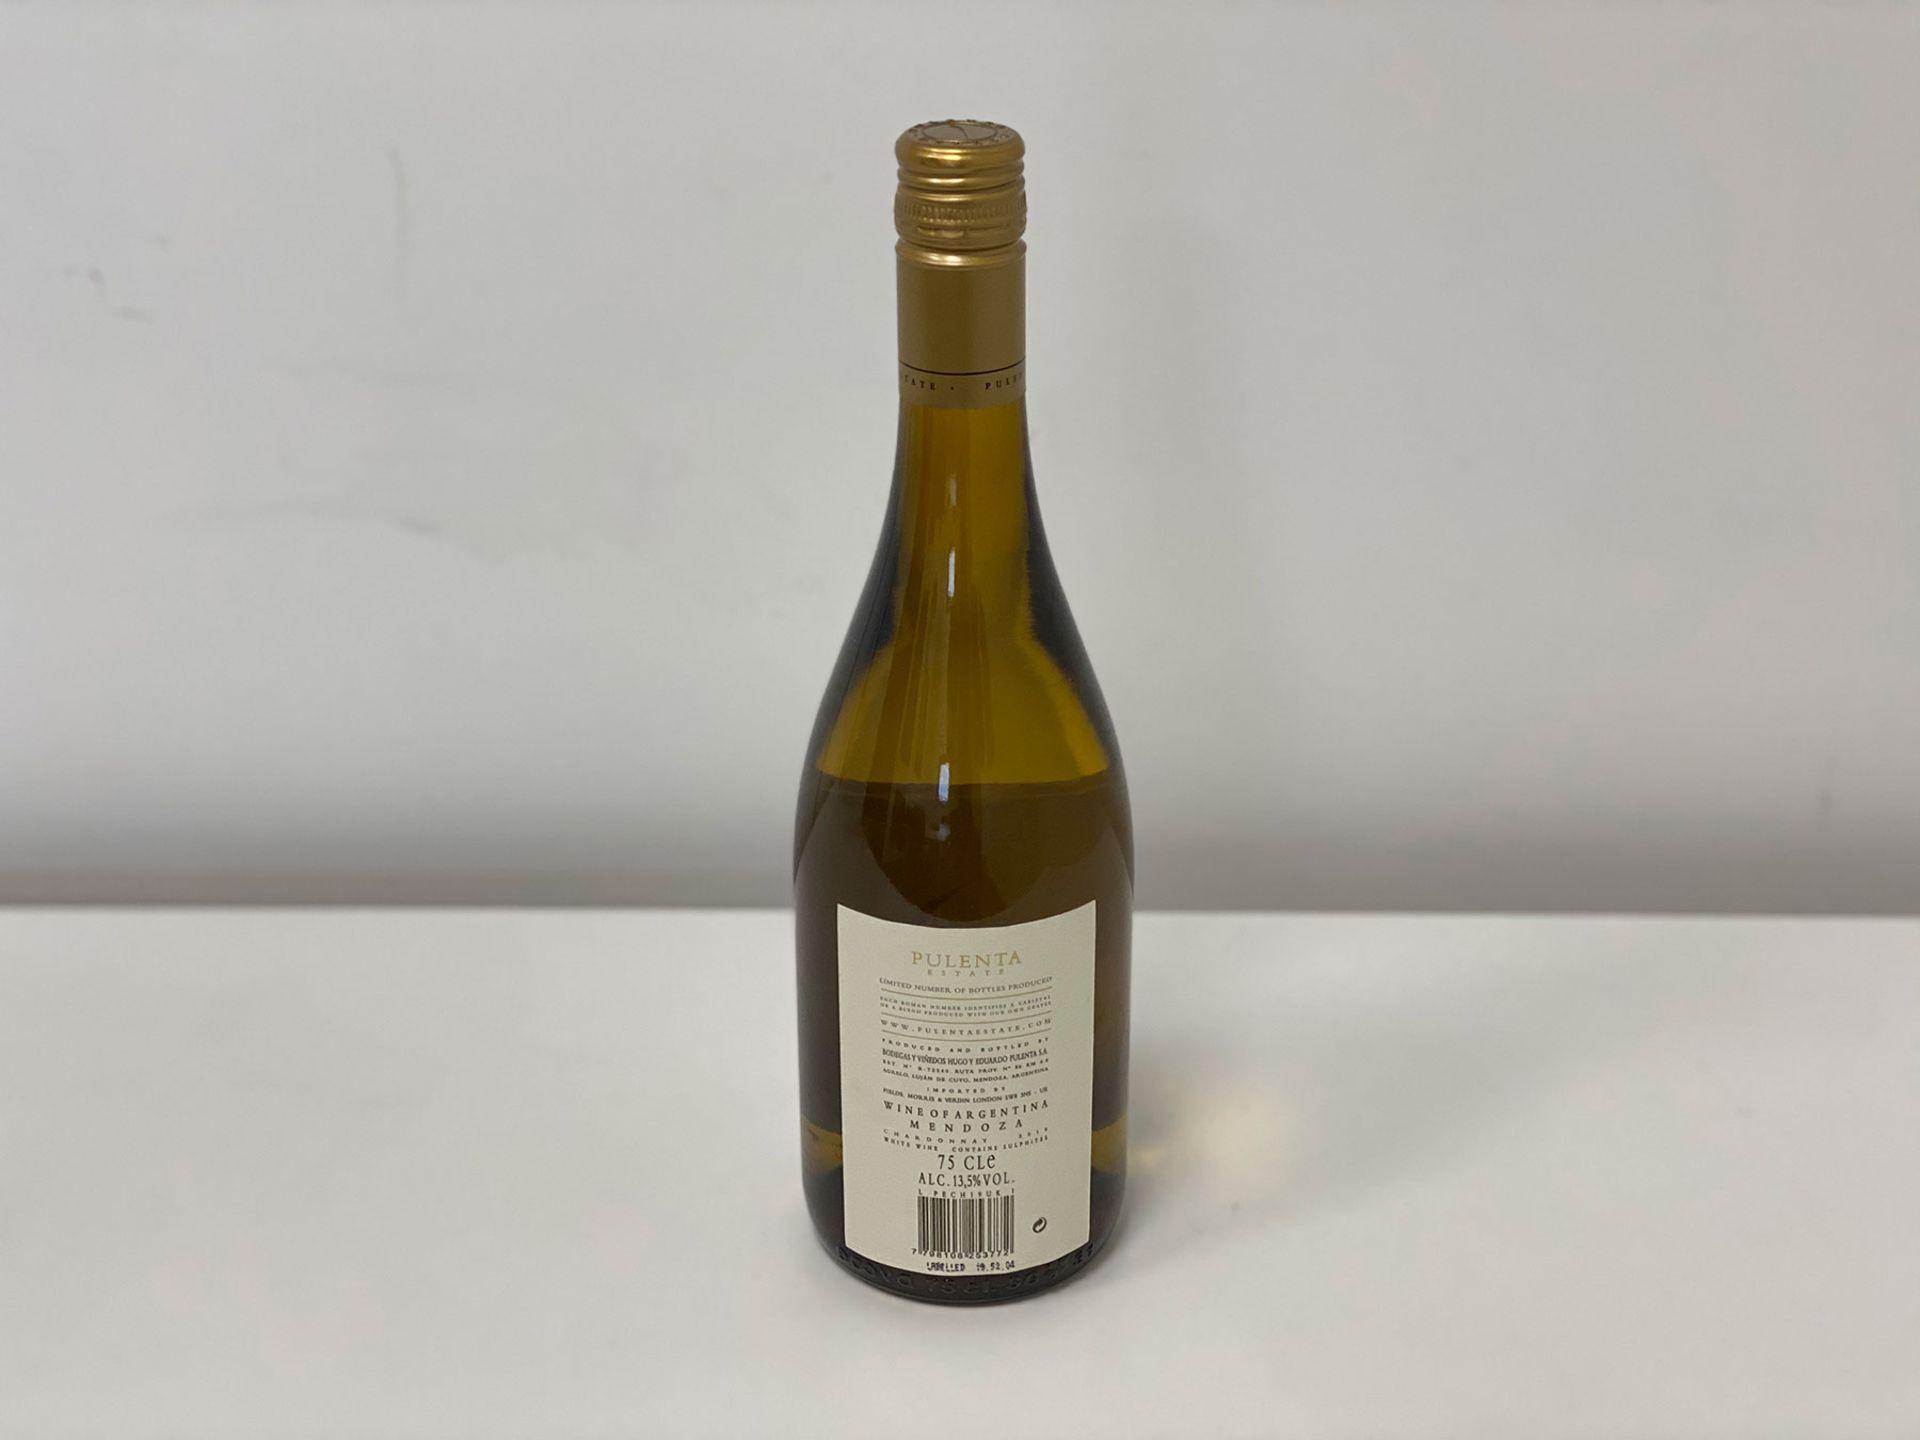 30 Bottles (5 Cases) 2019 Pulenta Estate - Pulenta Estate - Chardonnay - Mendoza - Image 2 of 2